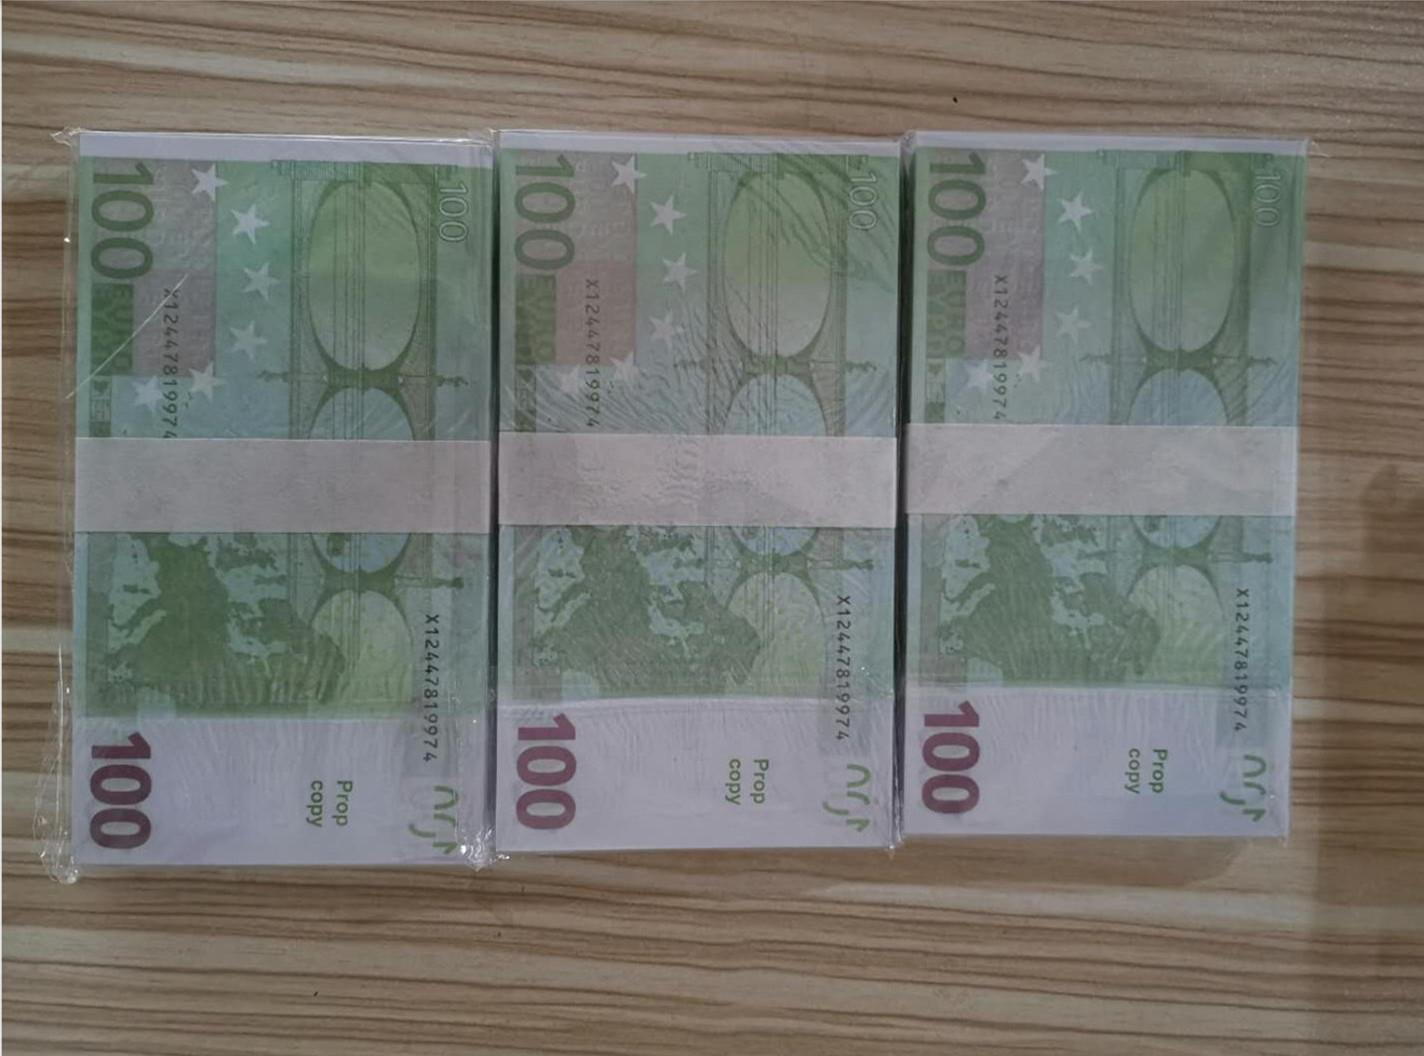 Magic Euro Props New Money Falsifit Gift Faux Euro Boleto 100 Billet FMXUD Prop Toy Paper LE100-46 NIÑOS JHIHK